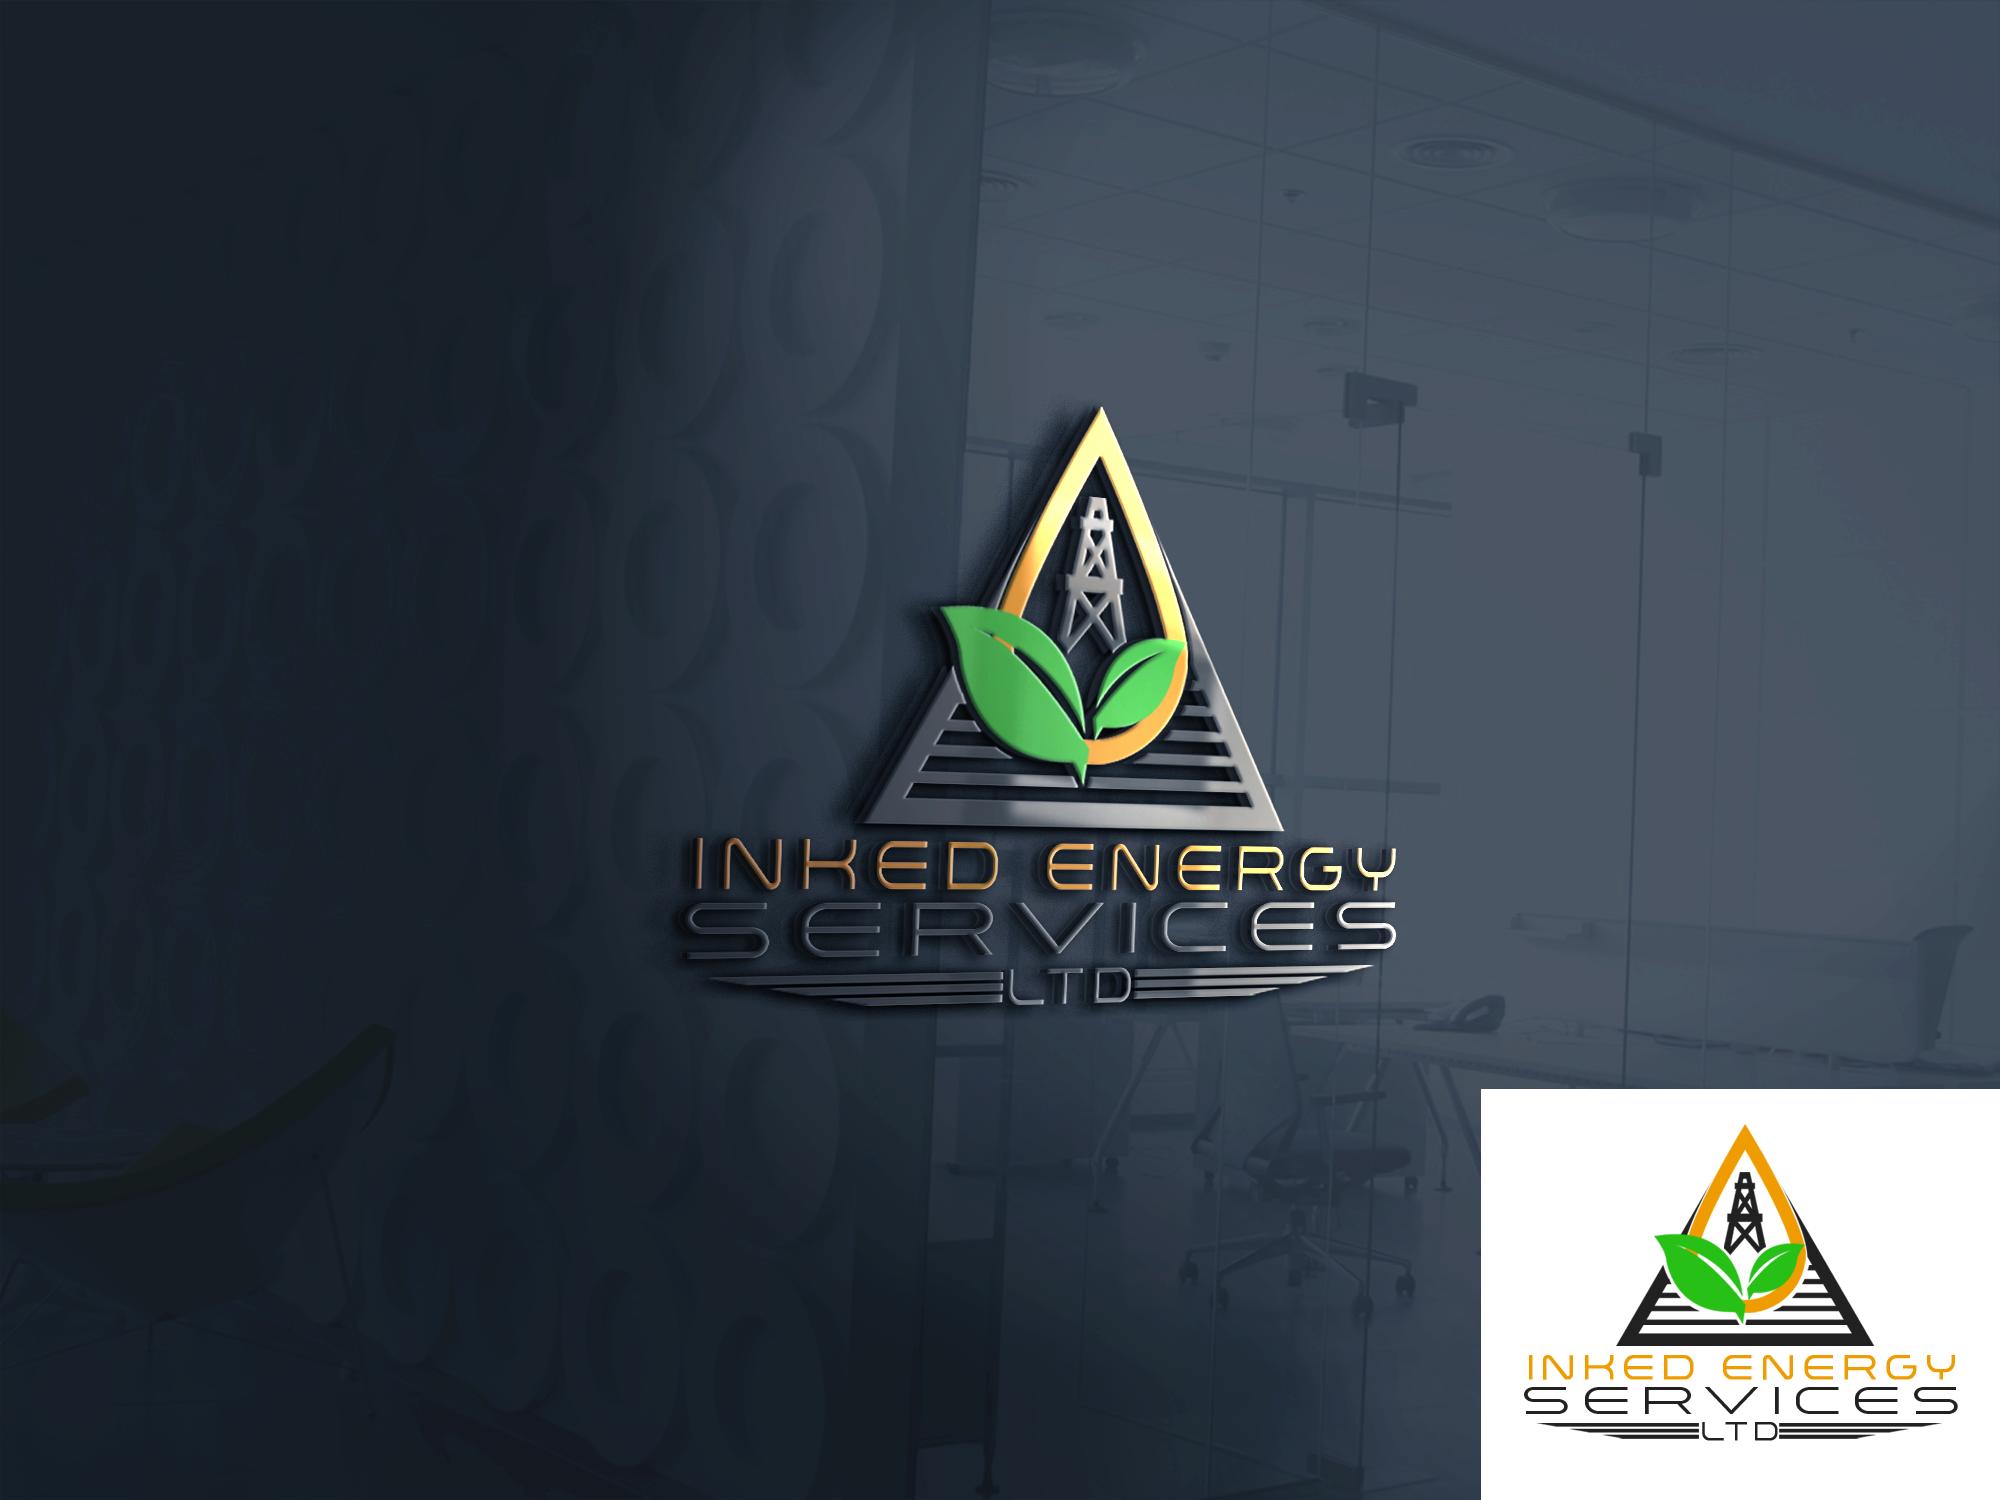 Logo Design by John Melvie Sulla - Entry No. 97 in the Logo Design Contest Creative Logo Design for INKED ENERGY SERVICES LTD.